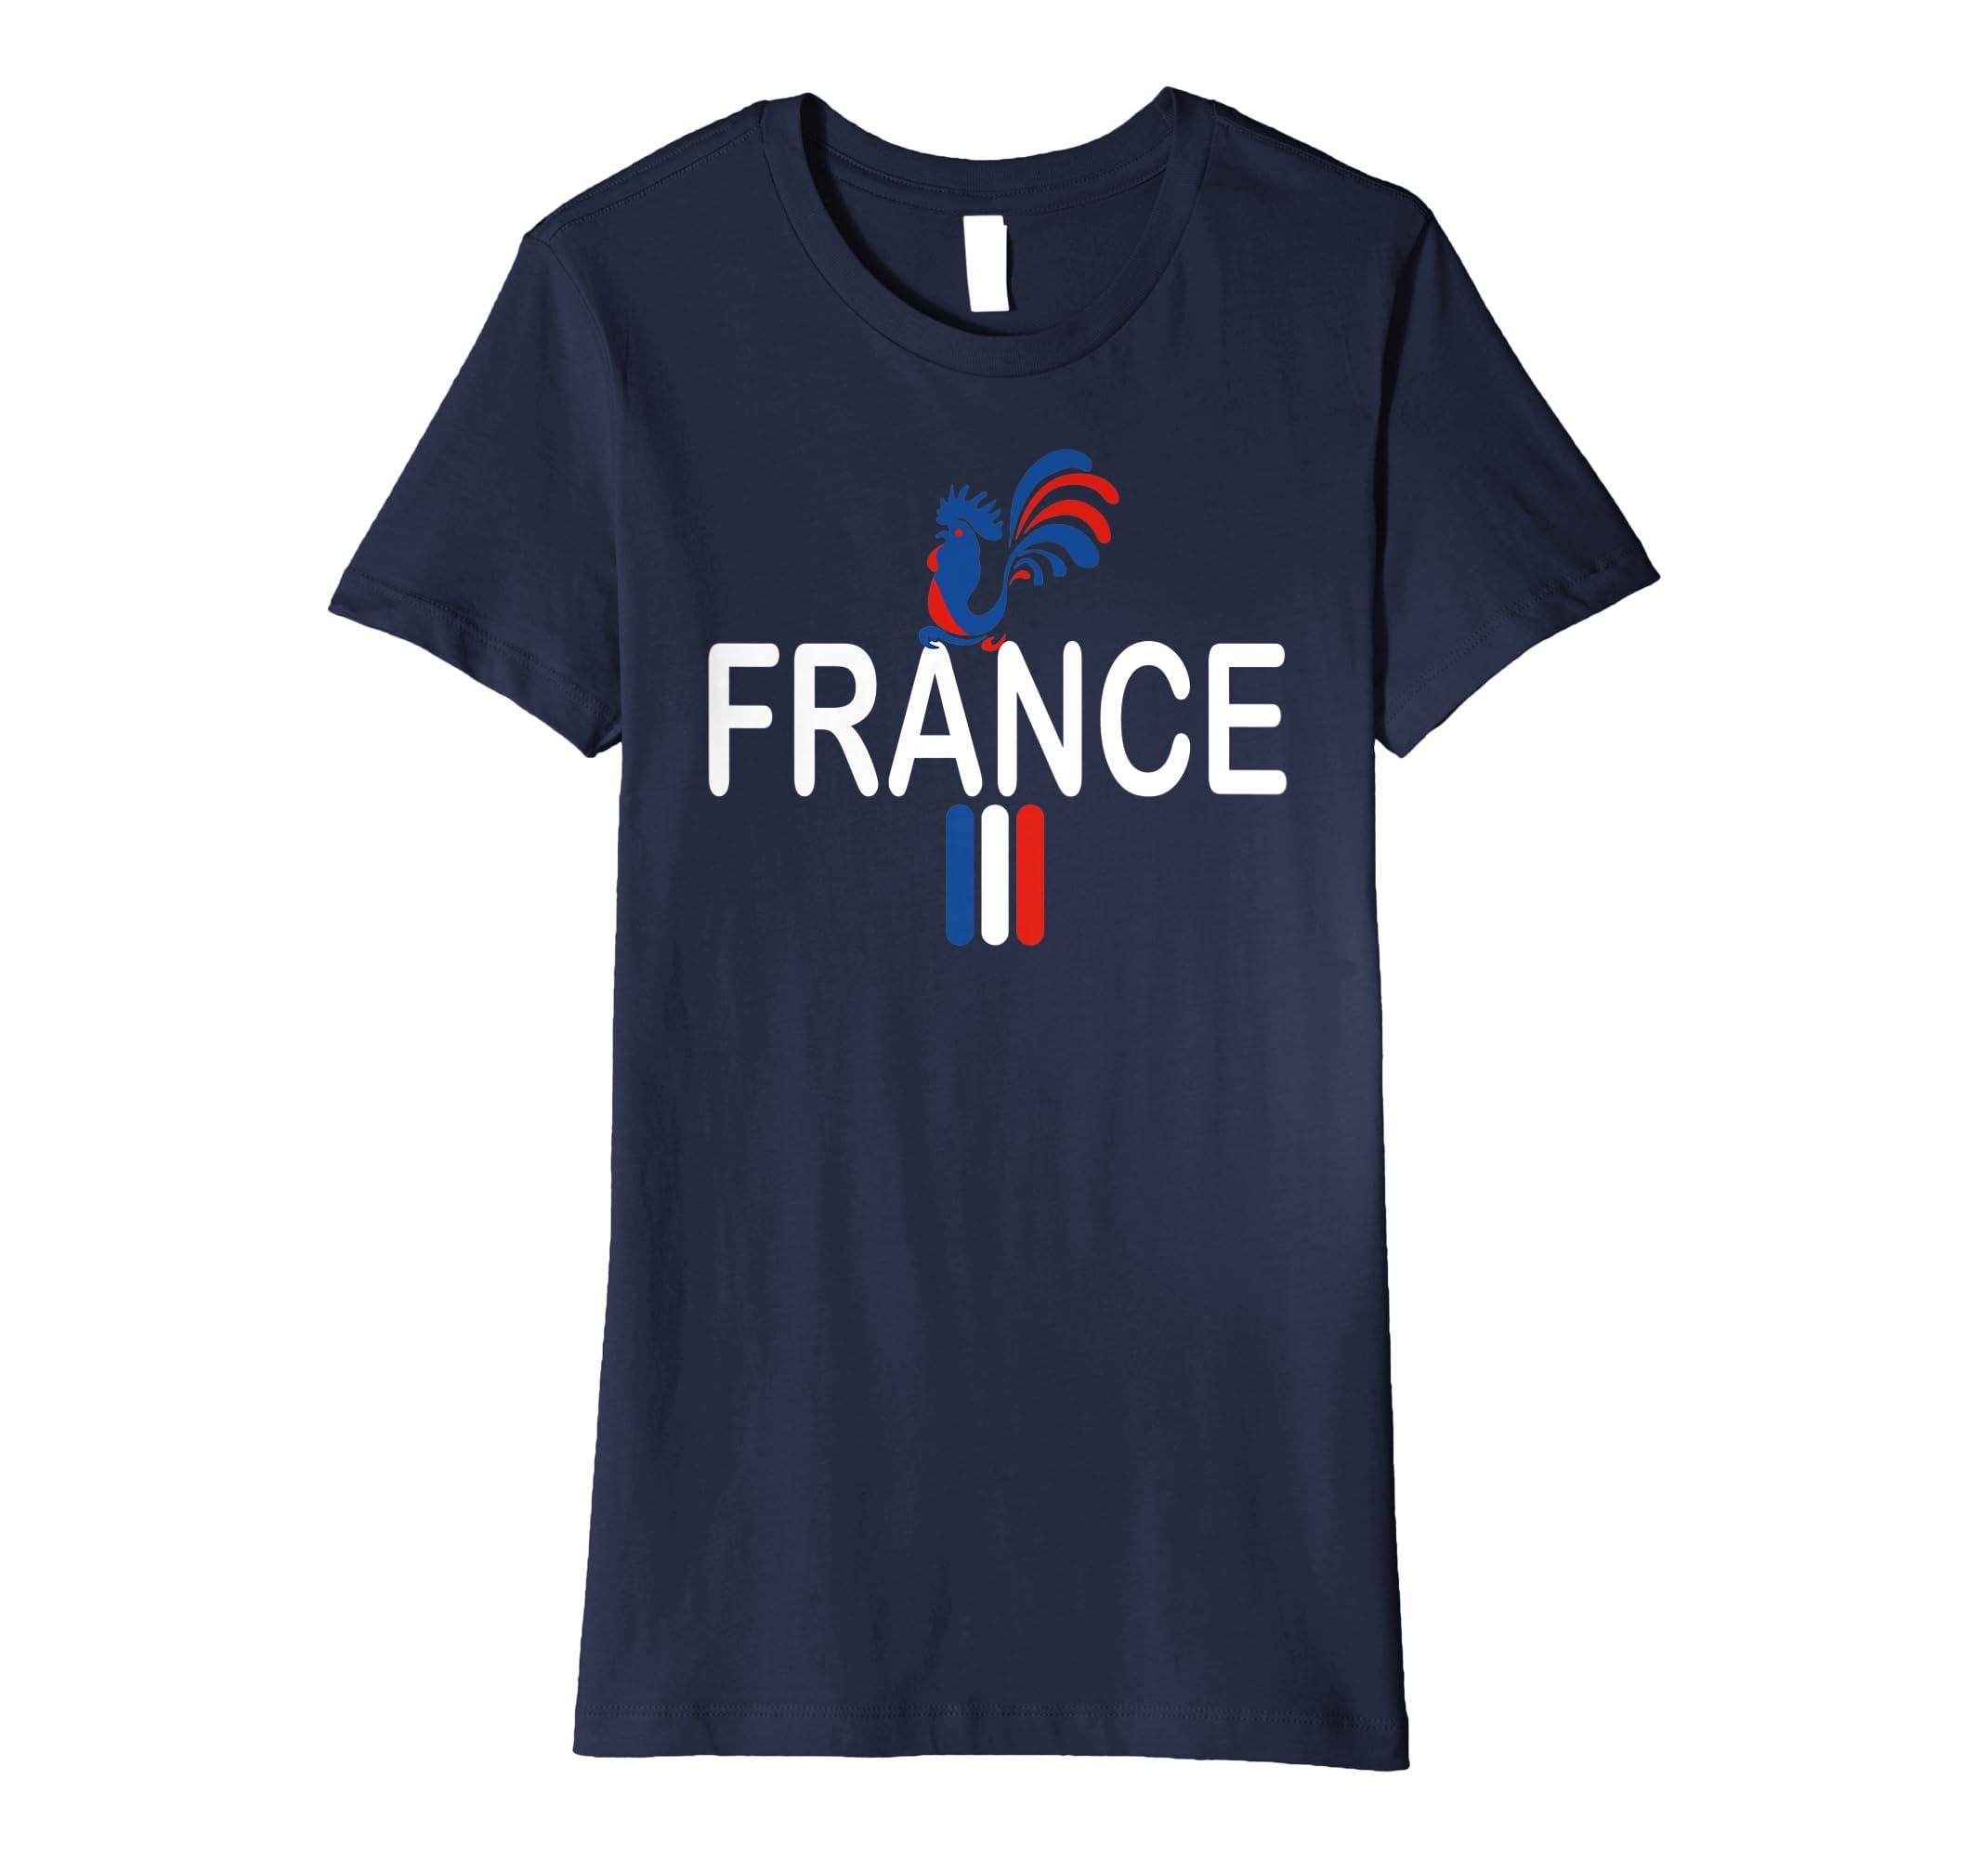 c3665bc63 Amazon.com  France Soccer Jersey Shirt France Football Team T-Shirt   Clothing